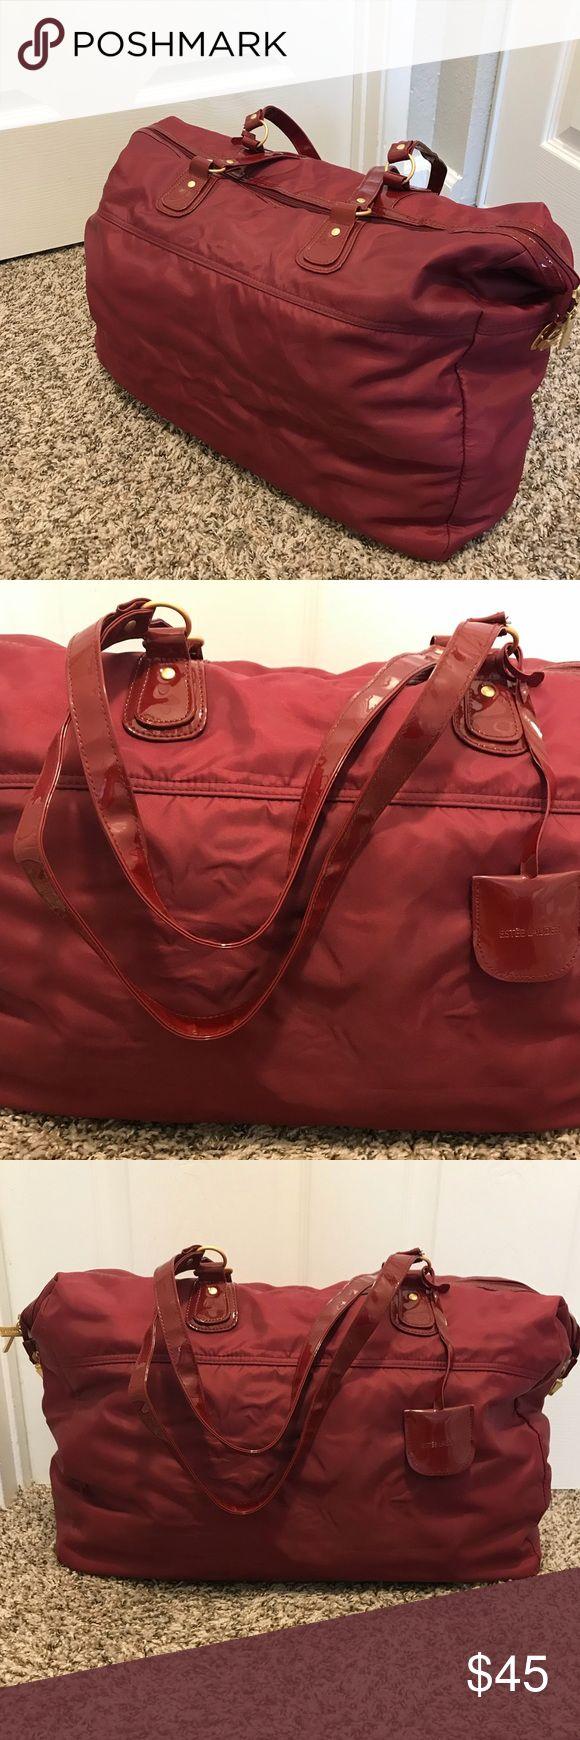 ... Ed Hardy Bags Bag Poshmark  los angeles bf9af 75974 ... the latest  fa277 d4074 Beautiful Deep Red Estée Lauder ... 8dad7f8597